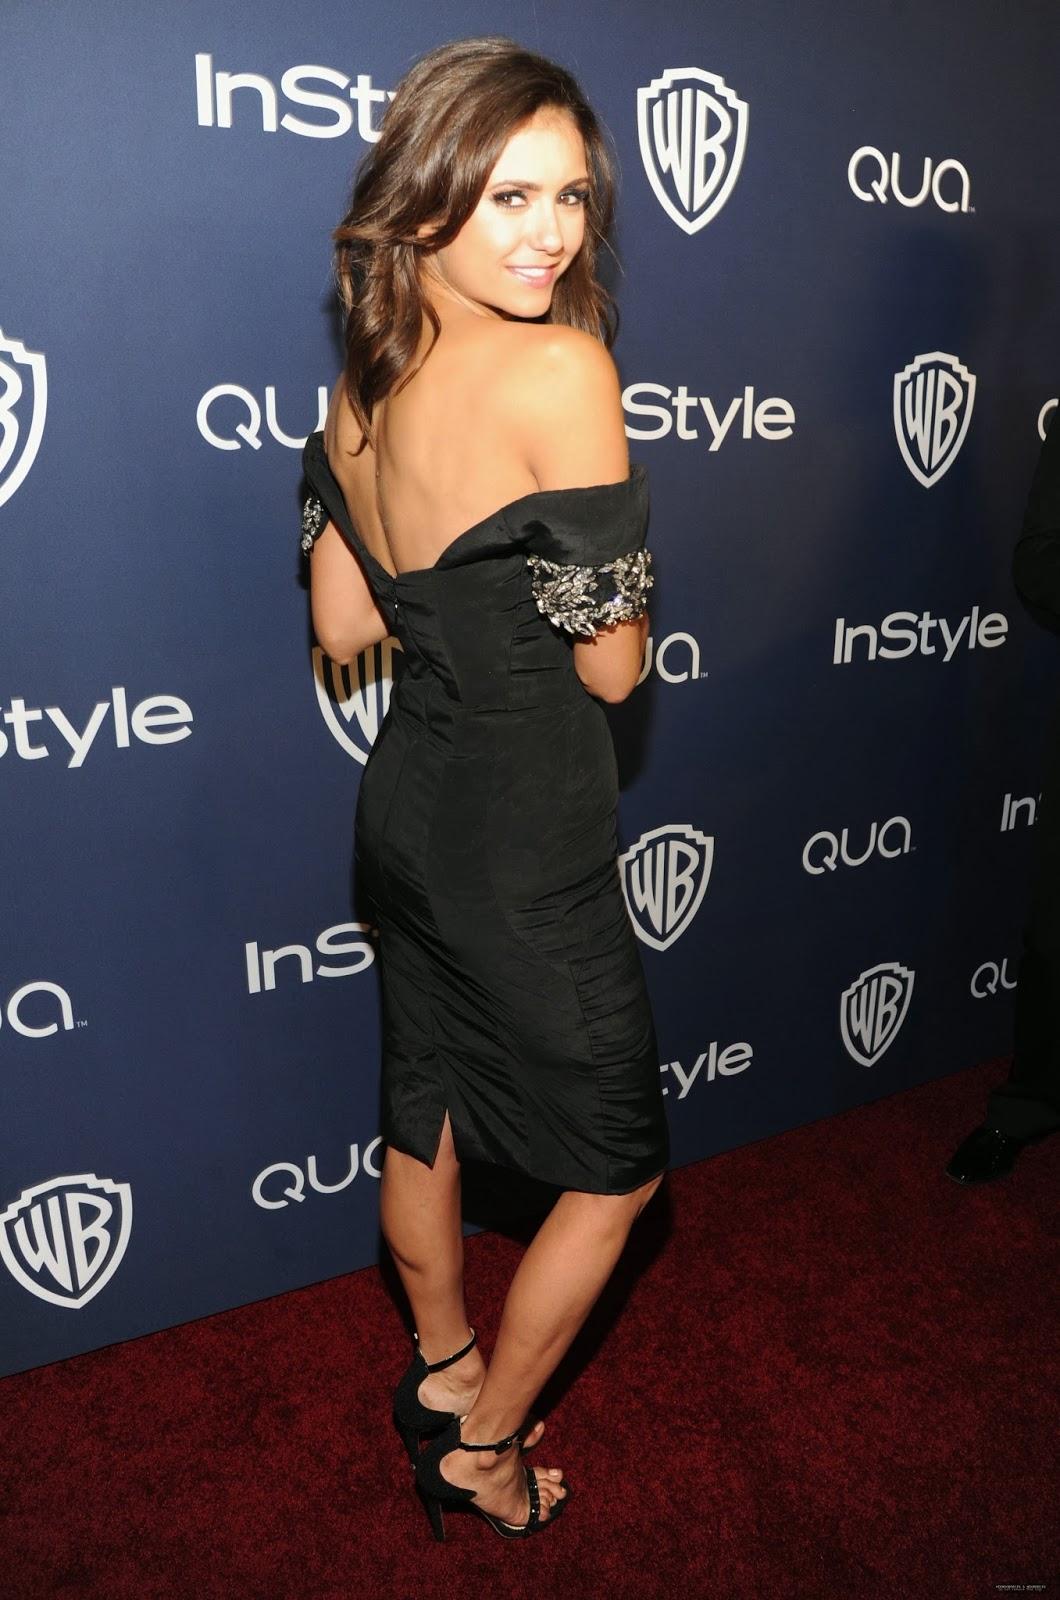 Nina Dobrev Dresses 2014 Red Carpet Dresses: Ni...